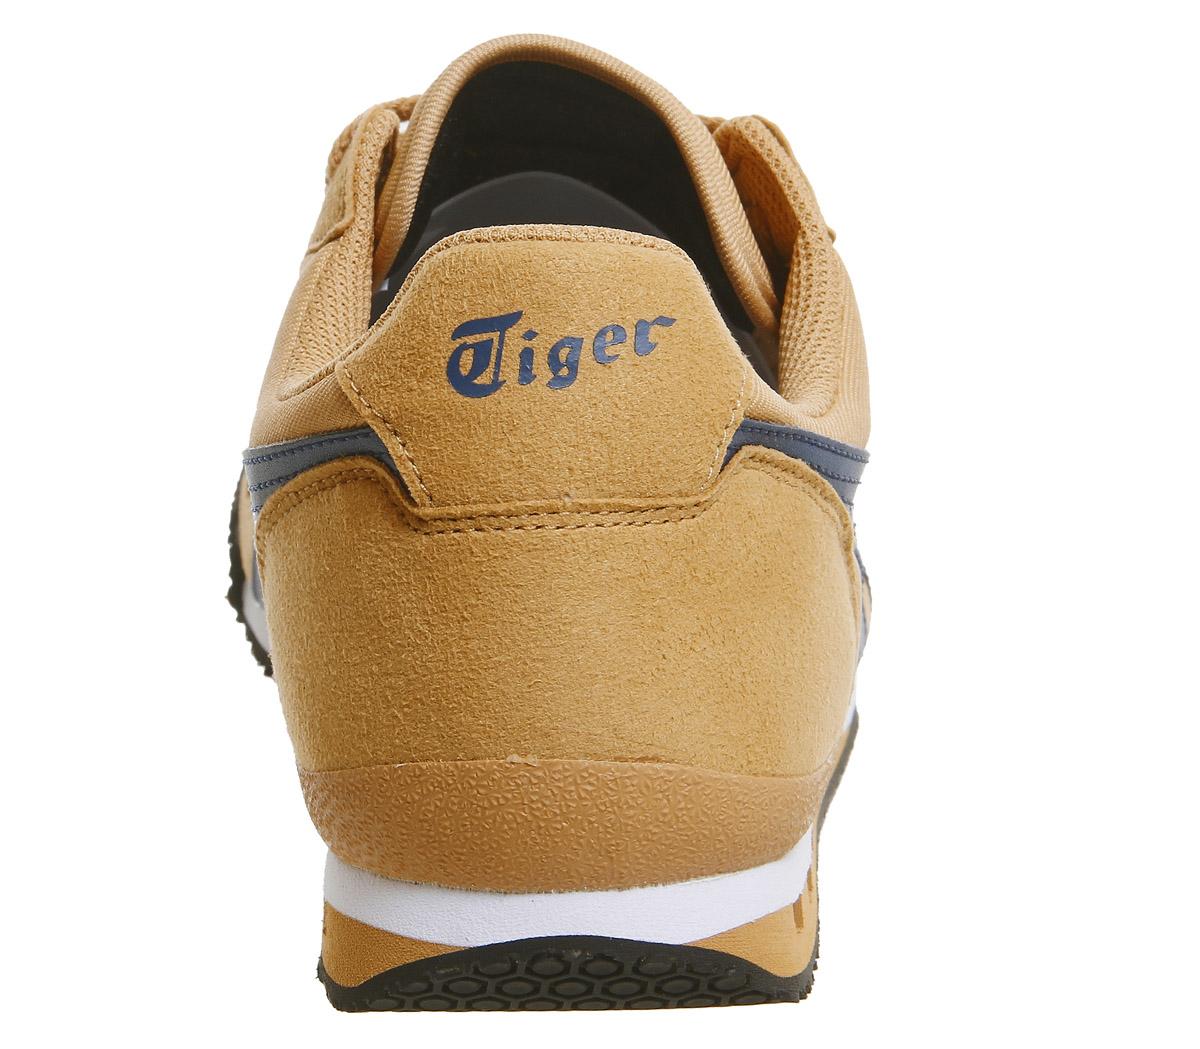 Onitsuka Tiger Ultimate 81 Trainers CARAVAN MIDNIGHT Blau Trainers Trainers Trainers Schuhes 3b8f57